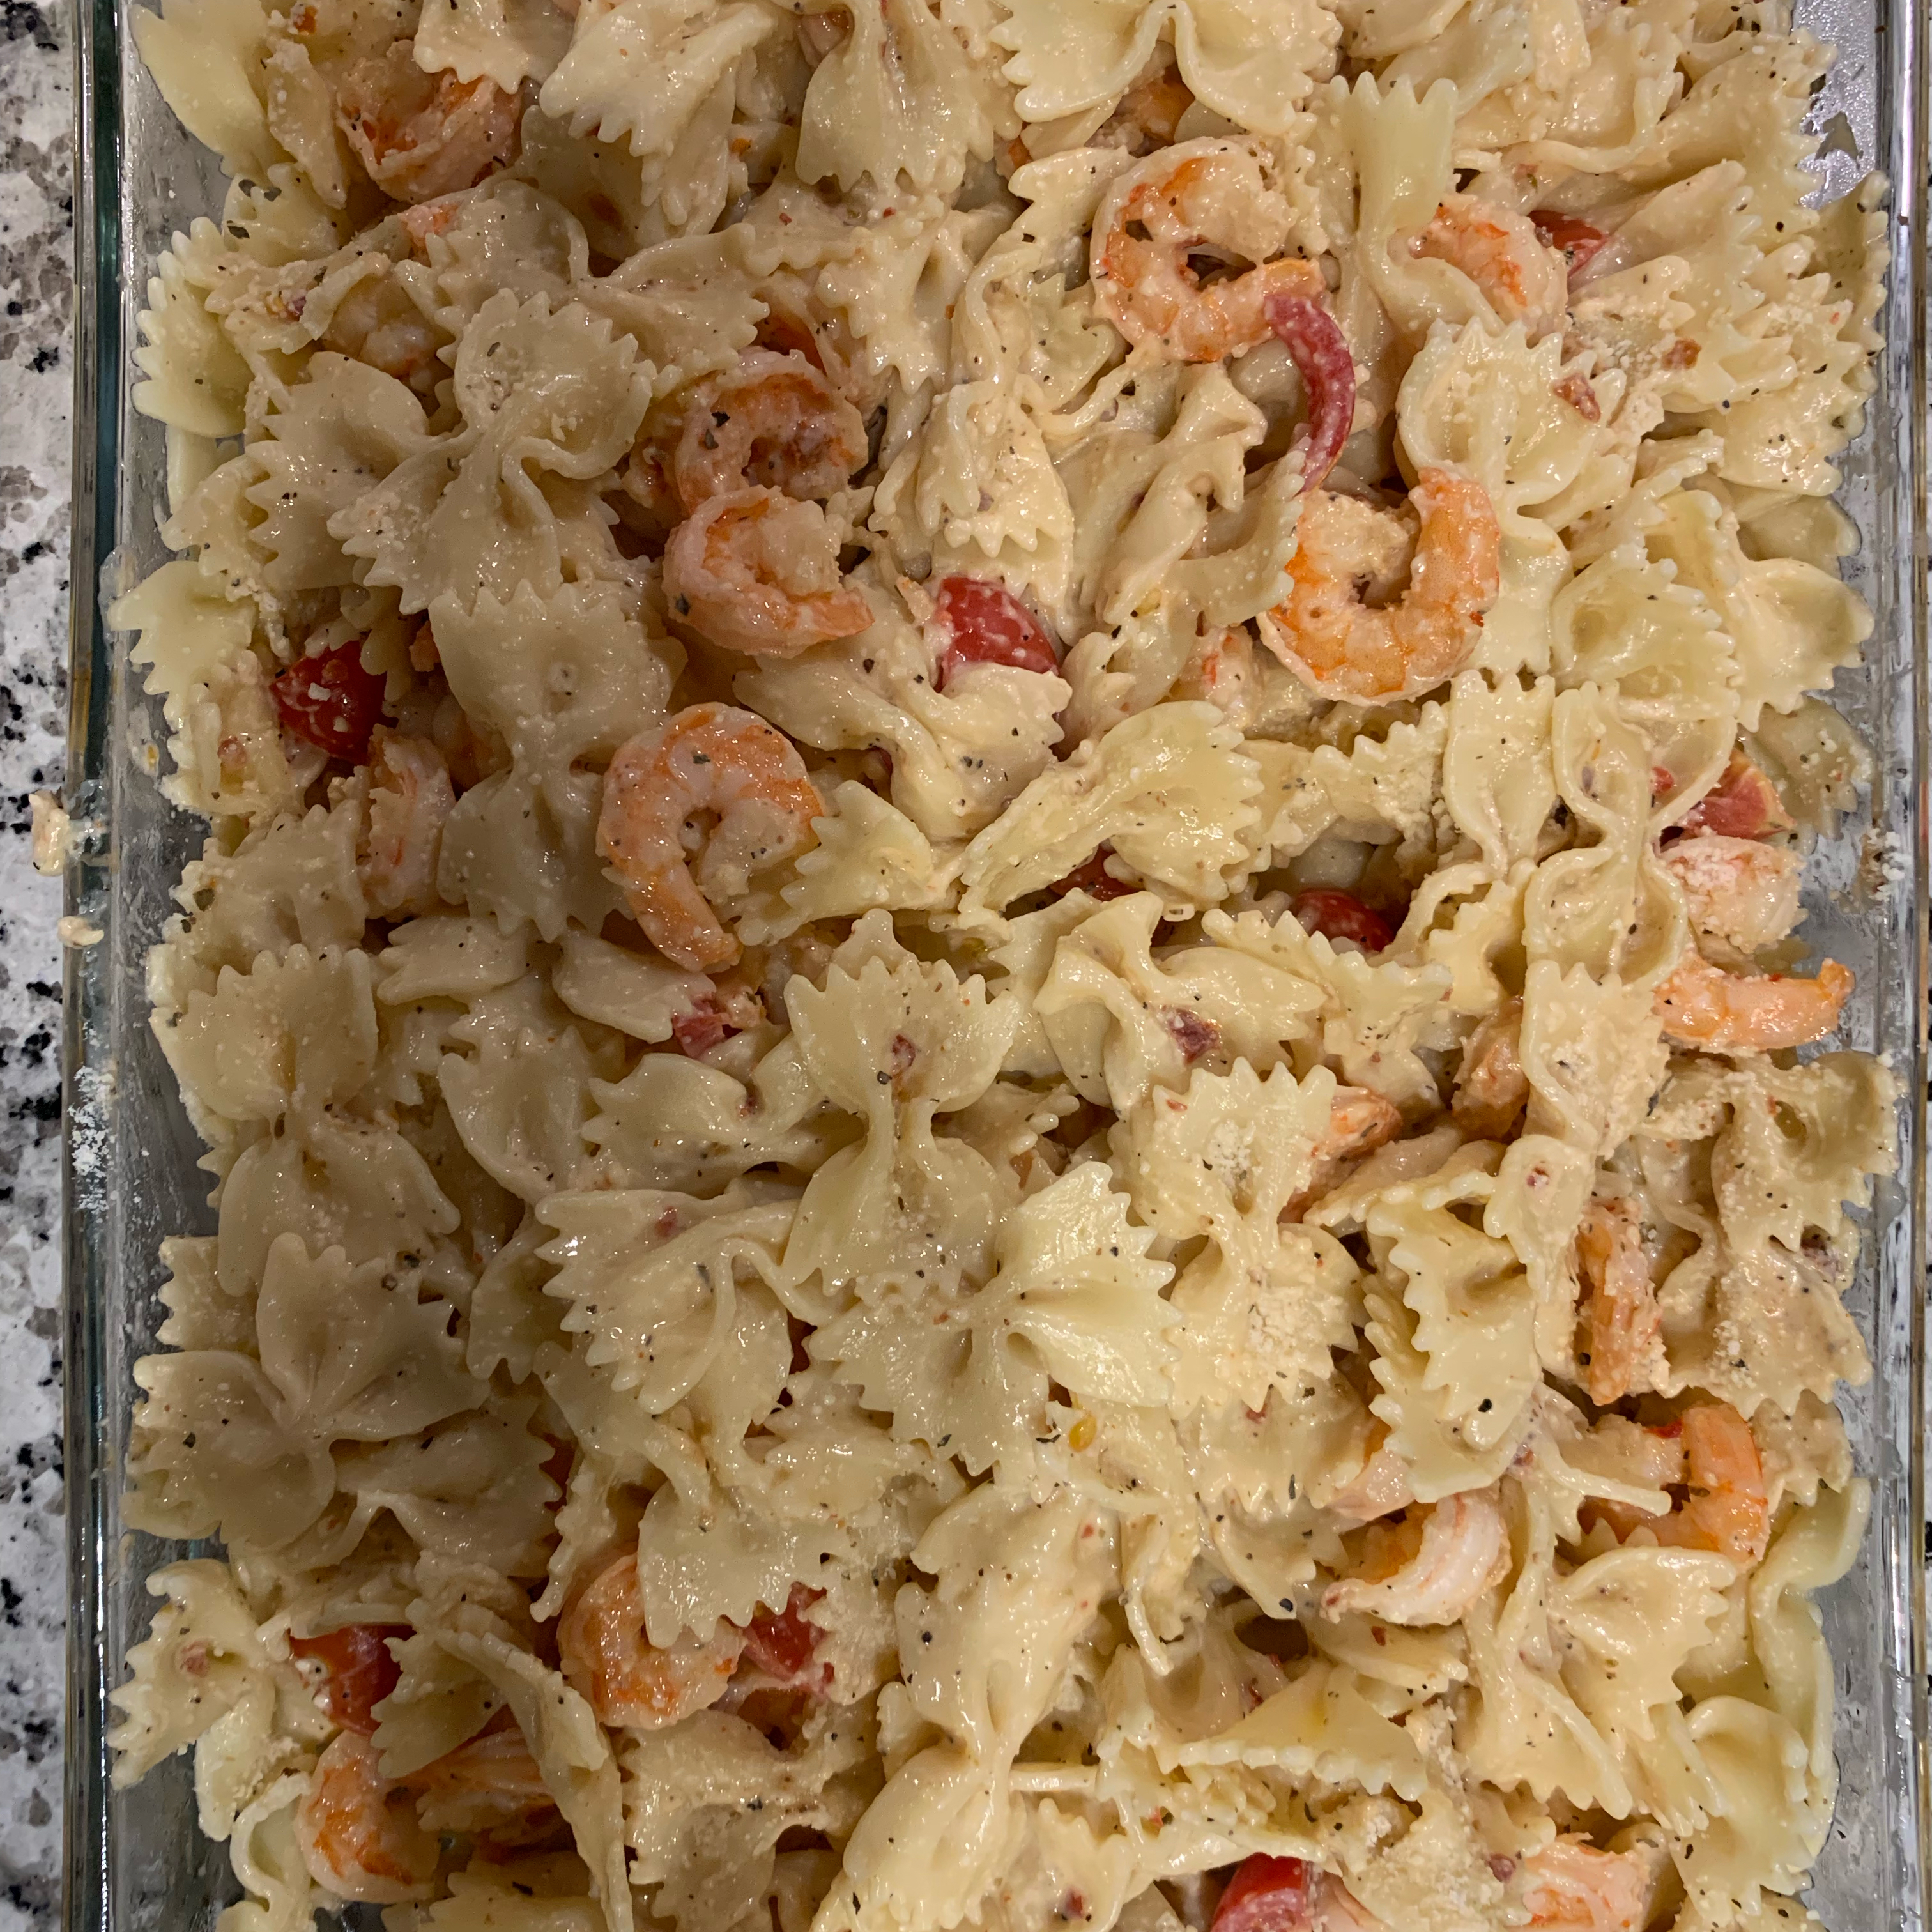 Creamy Tomato-Basil Pasta with Shrimp Flavia Gonzalez